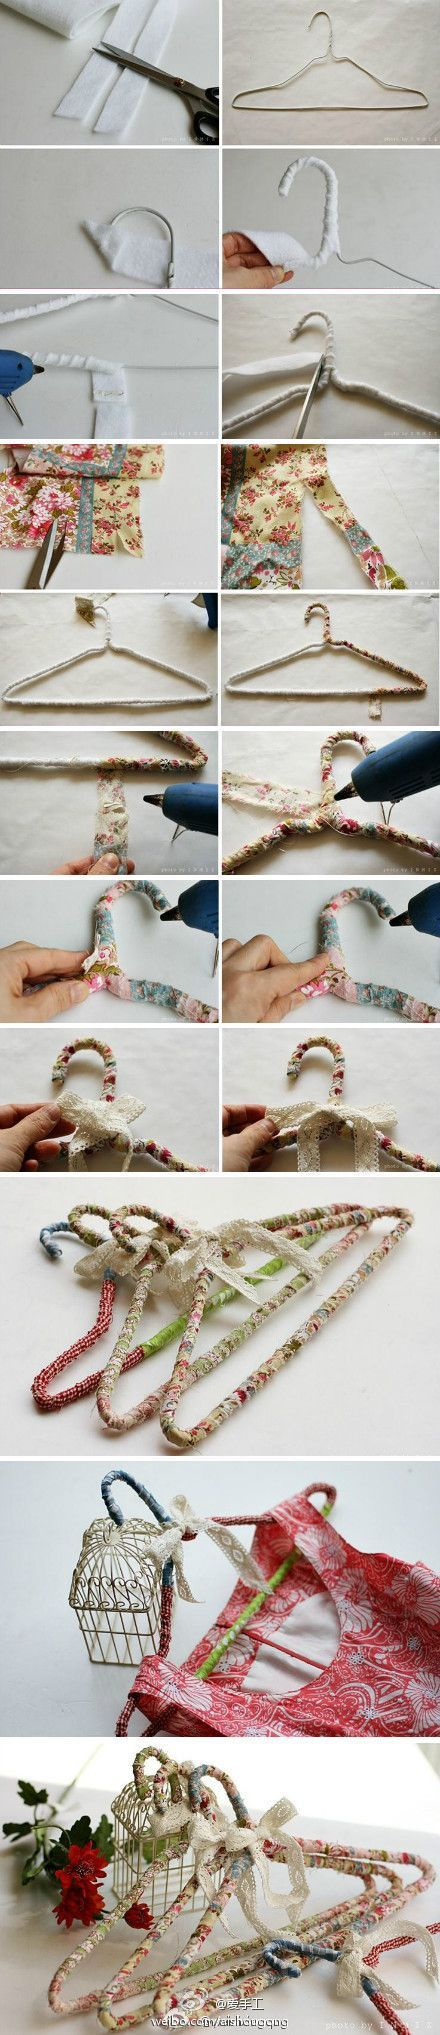 DIY Decorative Hanger DIY Projects   UsefulDIY.com Follow Us on Facebook ==> http://www.facebook.com/UsefulDiy